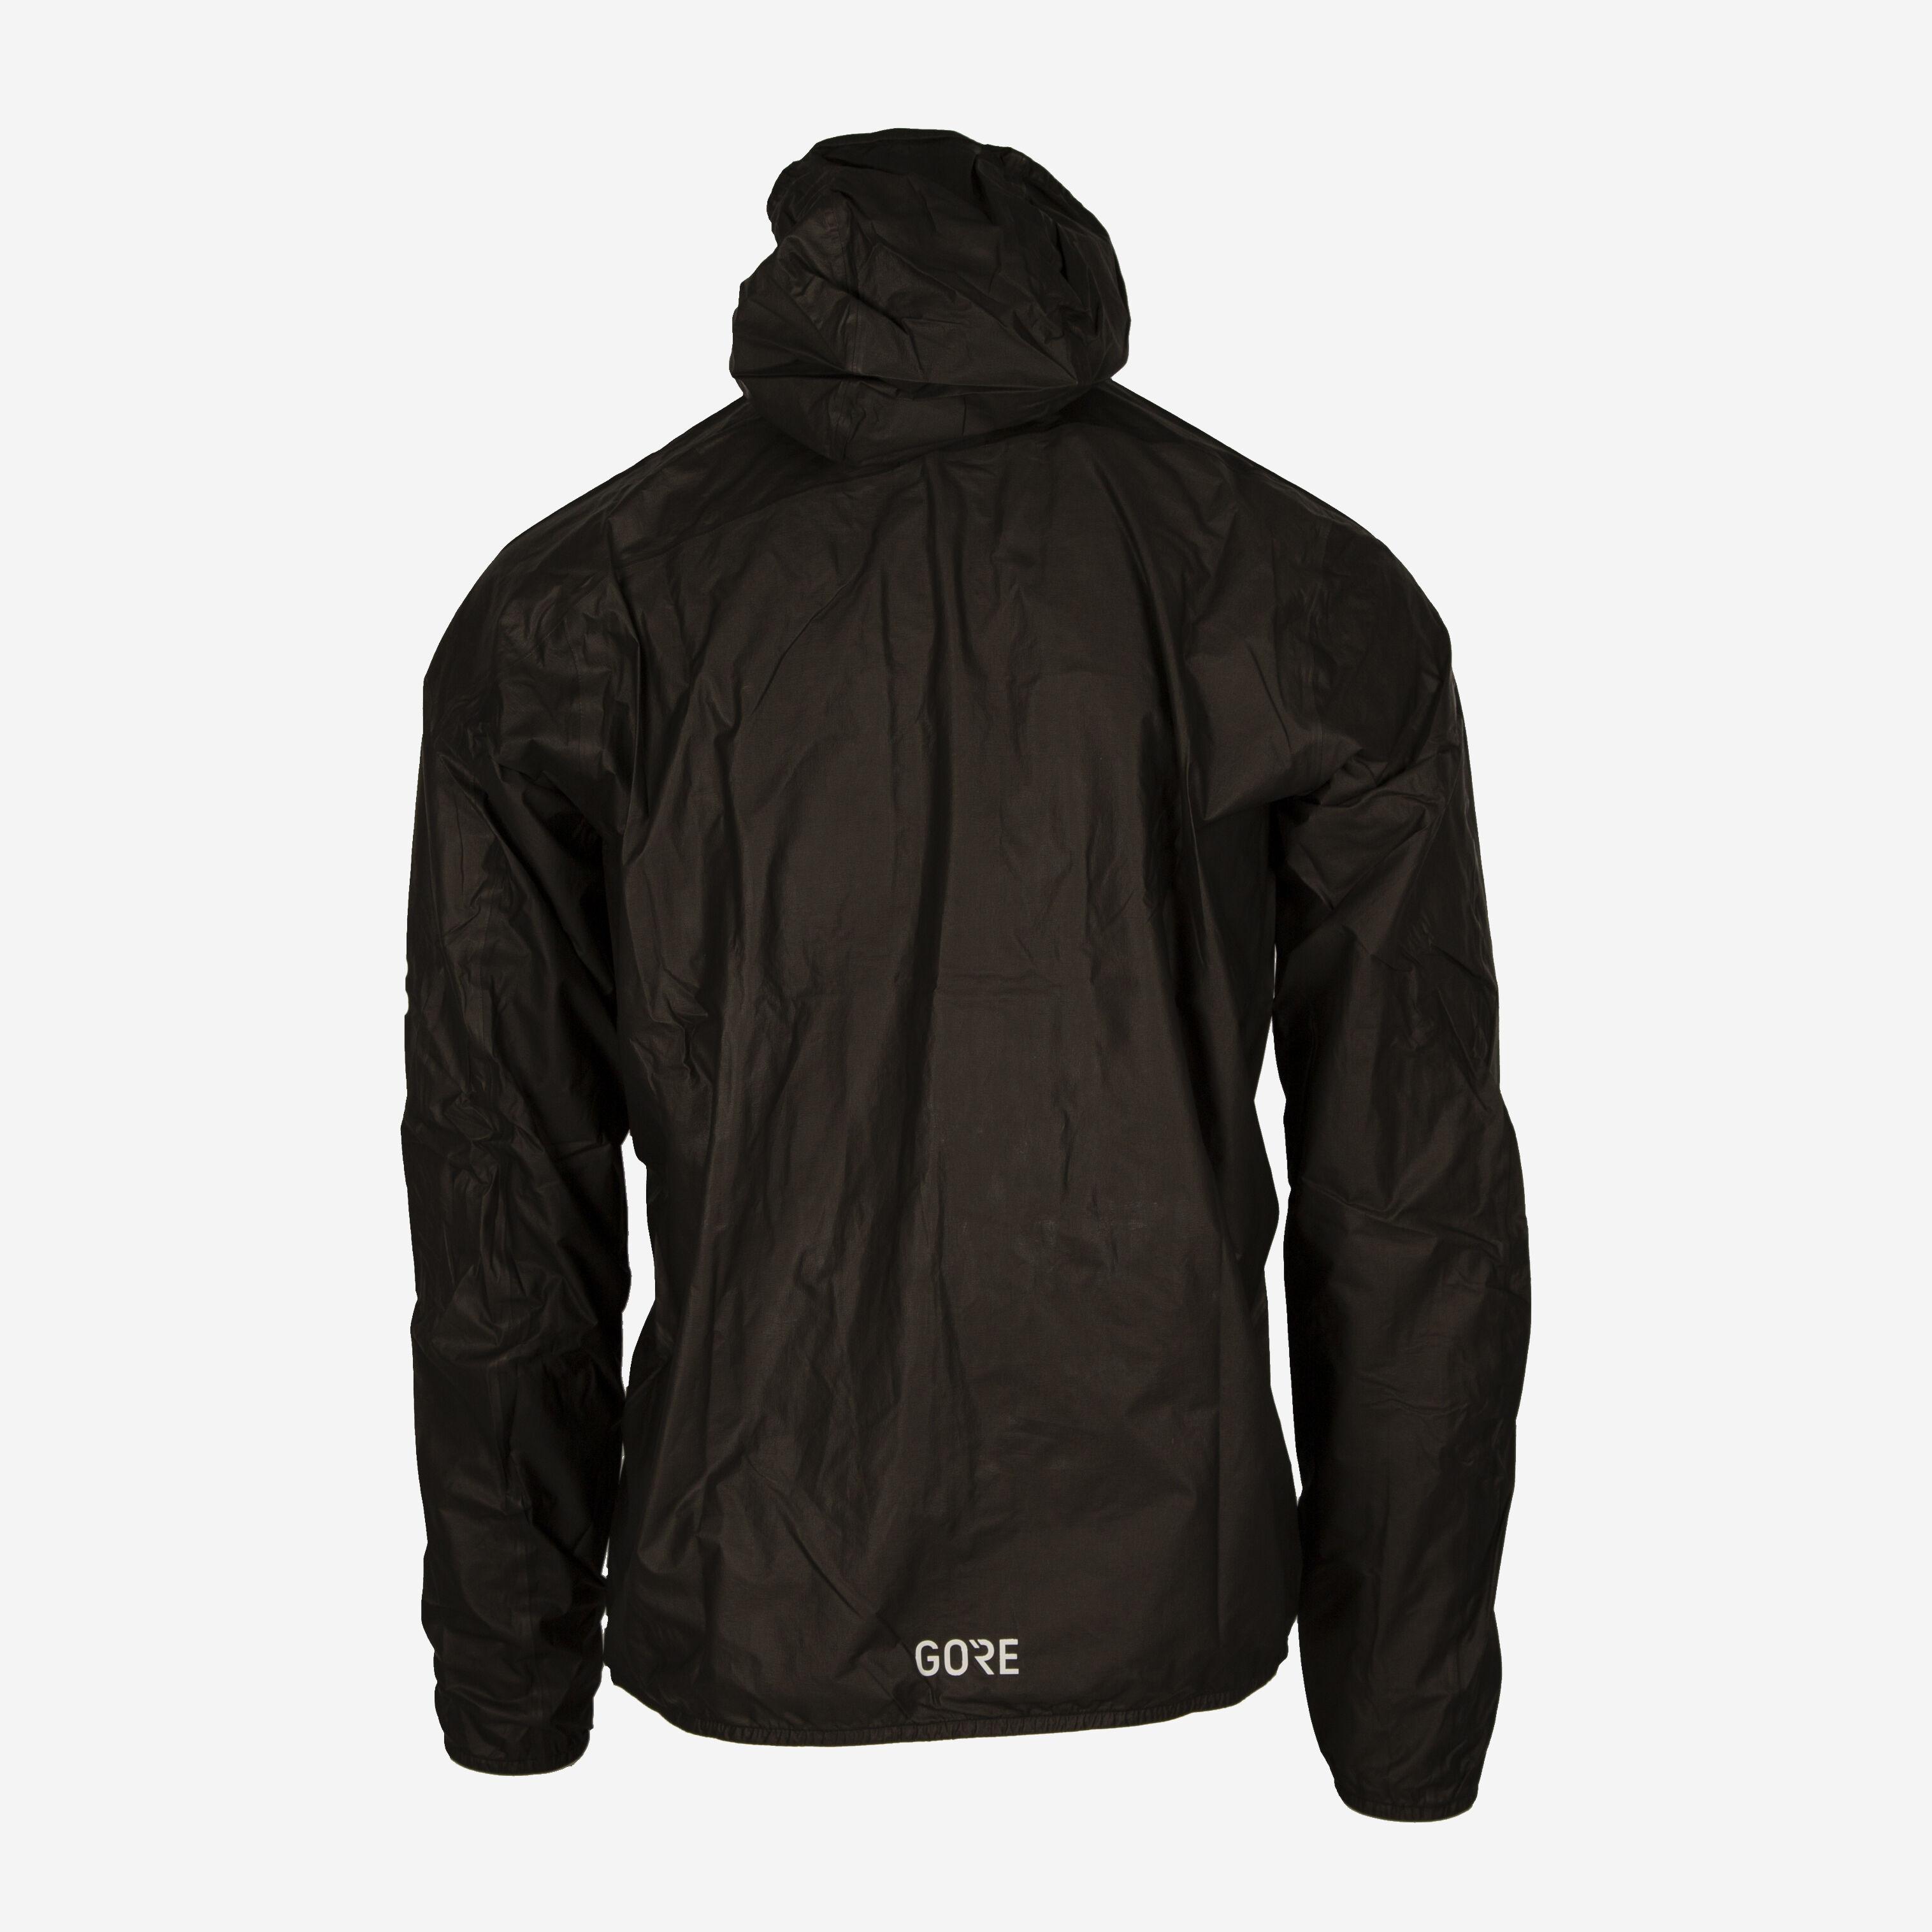 38c63603106c2 Gore R7 Shakedry Running hooded jacket 2019 RUNKD online running store